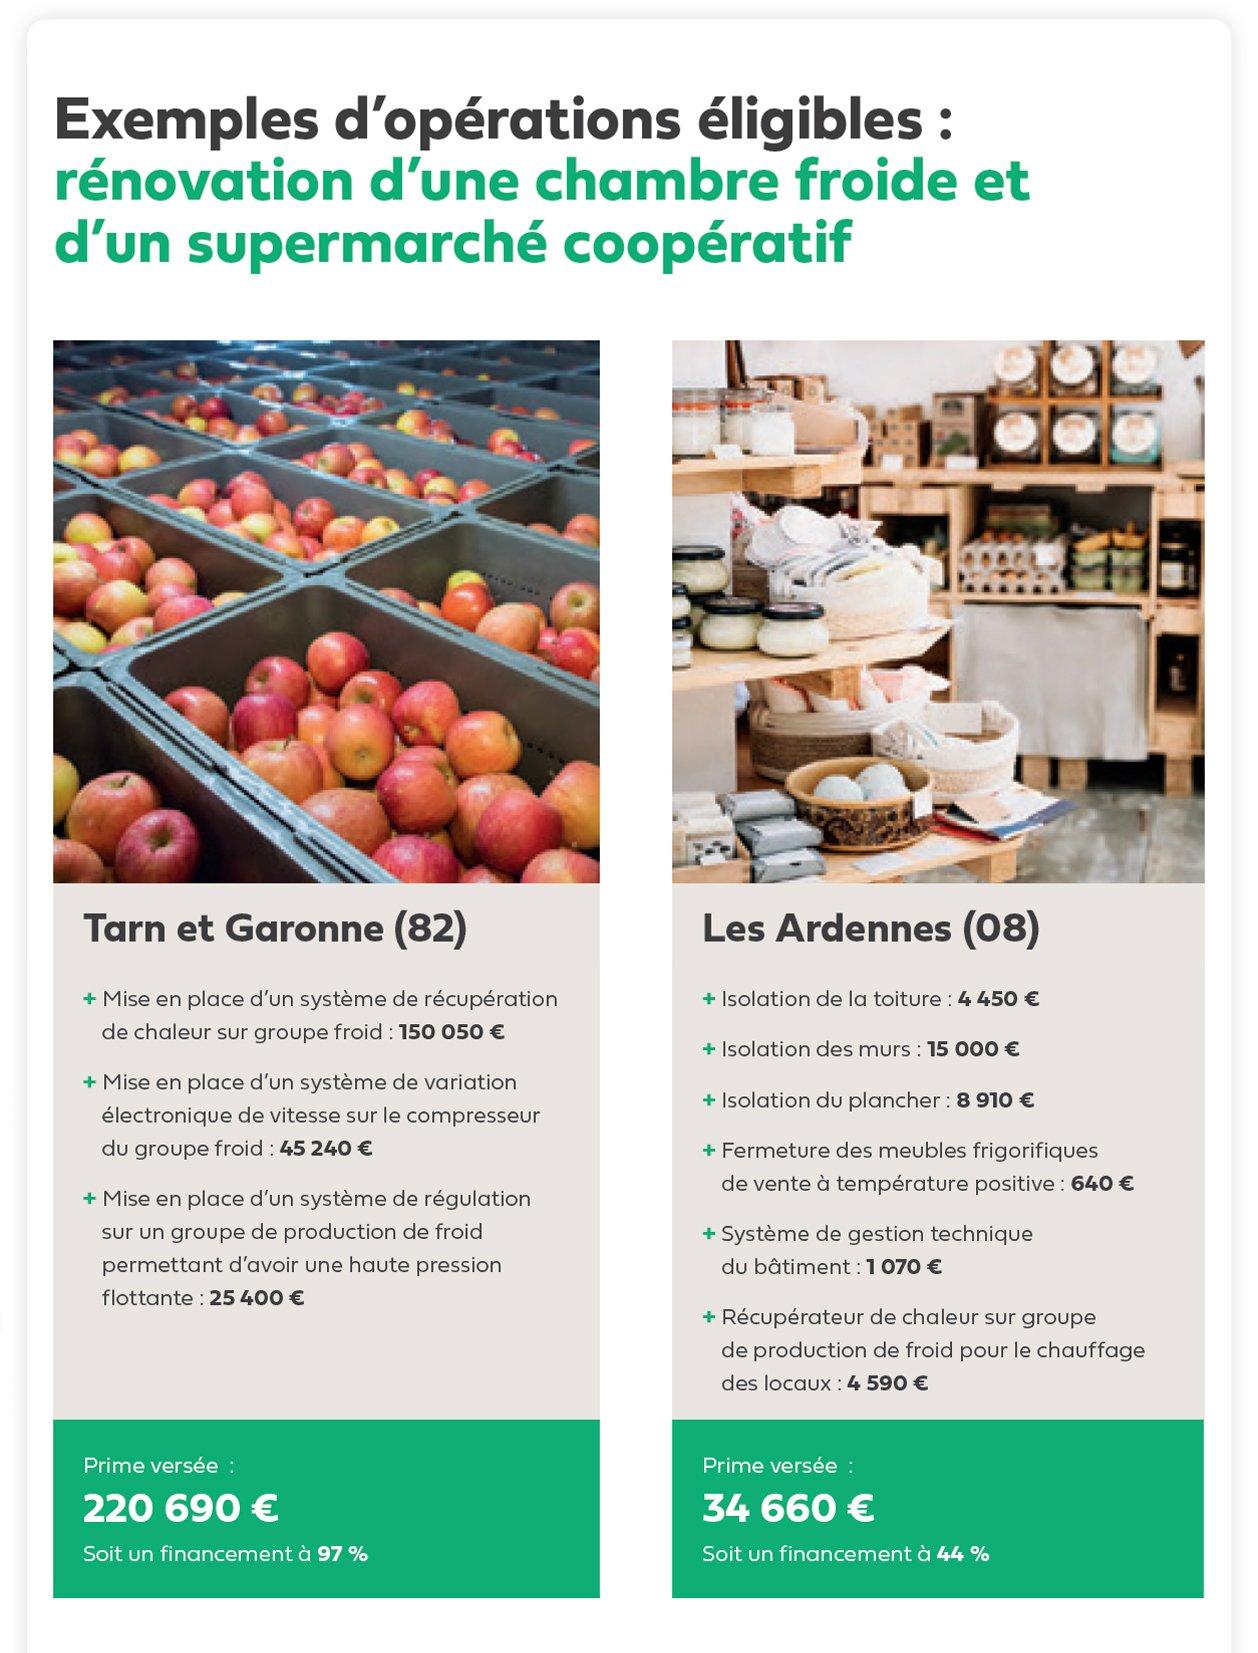 exemple-opération-cp-agriculture copie